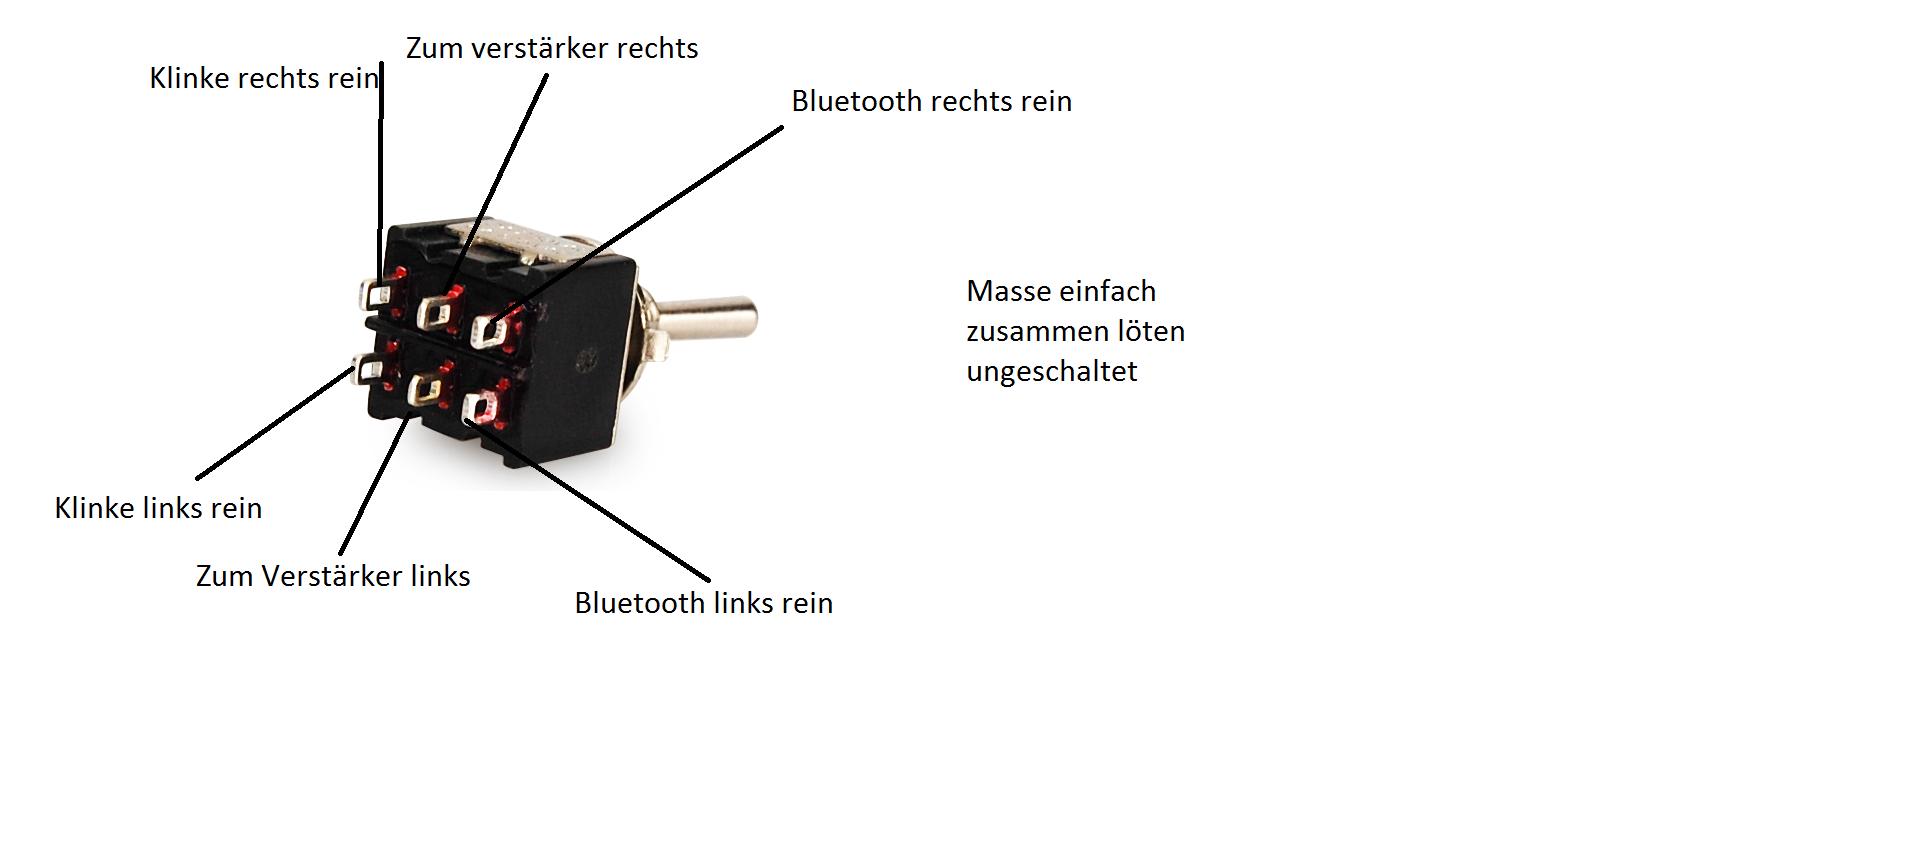 Schön 6 Poliger Kabelbaumplan Fotos - Elektrische Schaltplan-Ideen ...